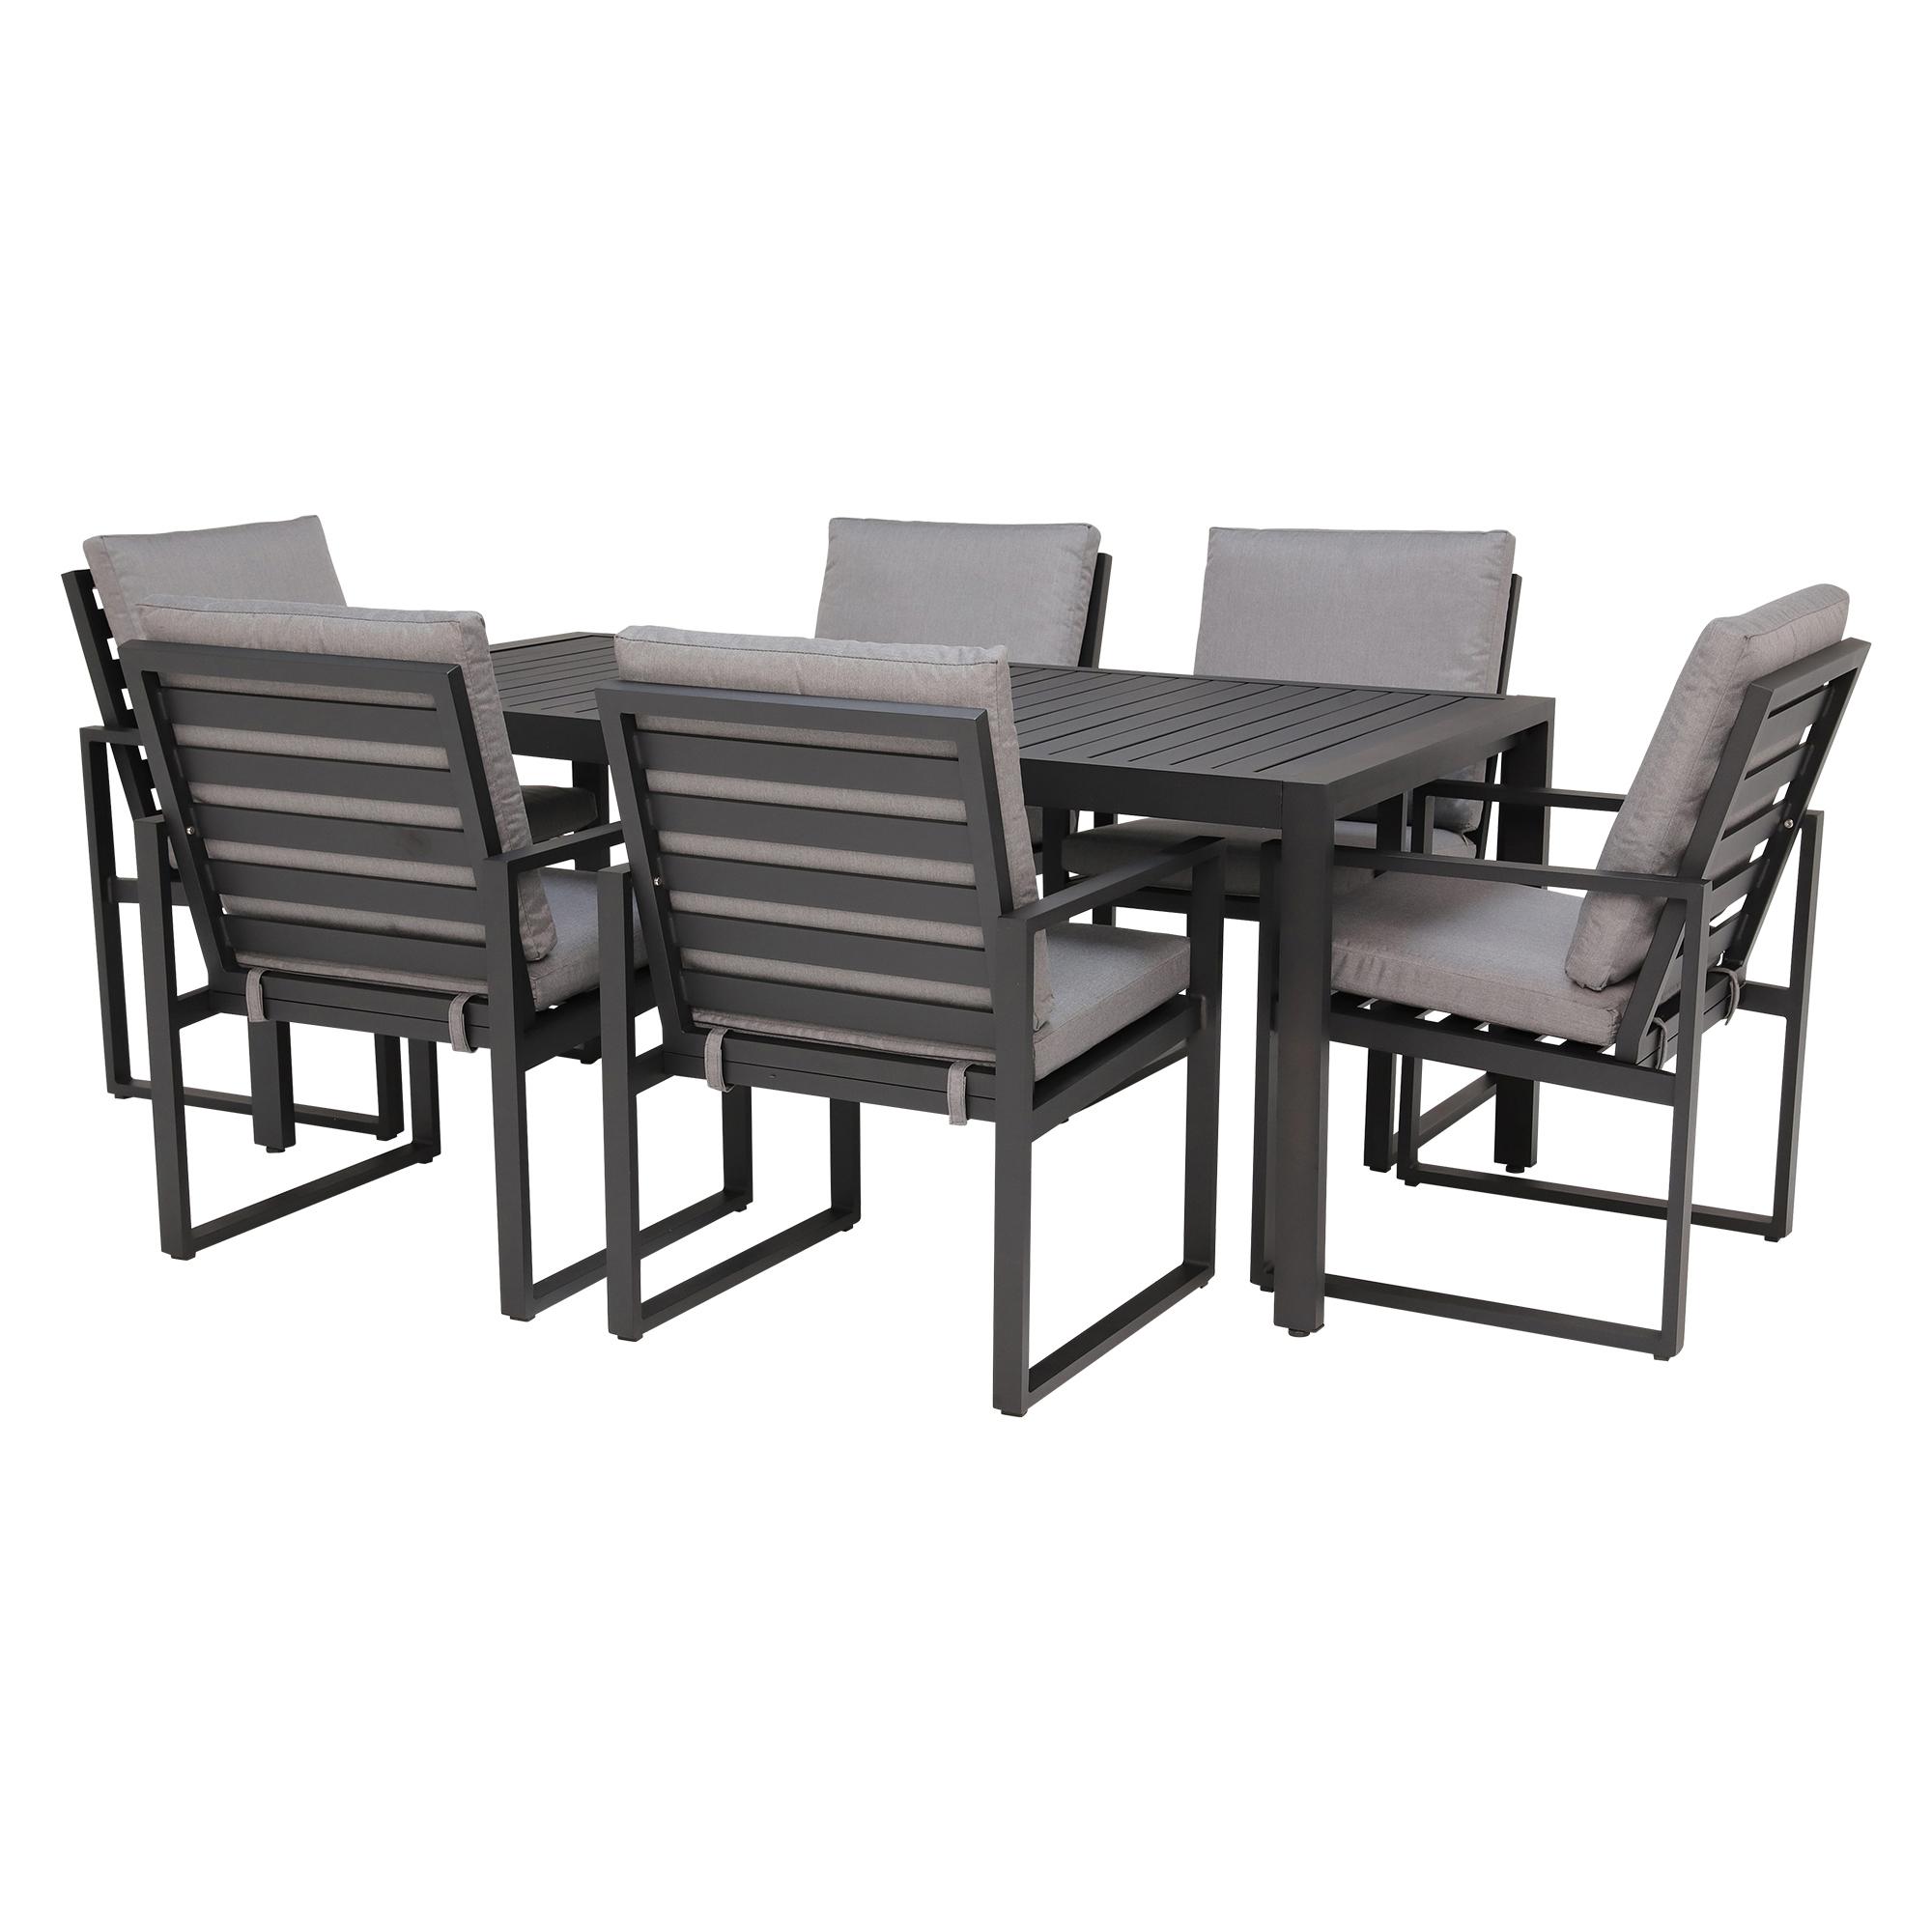 2017 Contemporary 6 Seating Rectangular Dining Tables Regarding Rufolo 6 Seat Garden Dining Set, Black & Grey – Barker & Stonehouse (View 16 of 30)